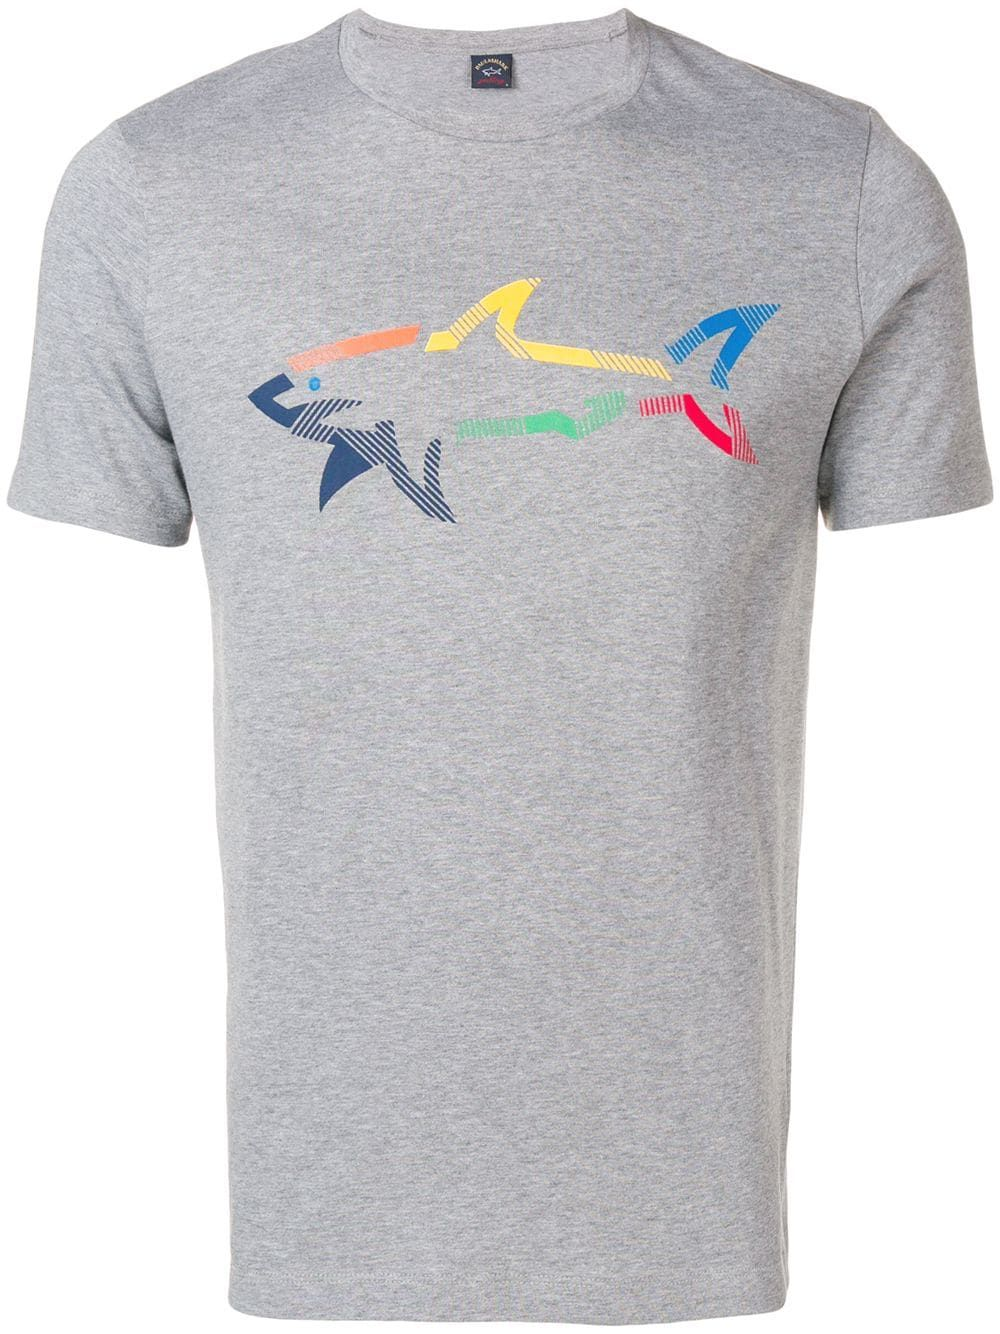 776481fcf Paul & Shark printed T-shirt - Grey in 2019 | Products | Paul shark ...